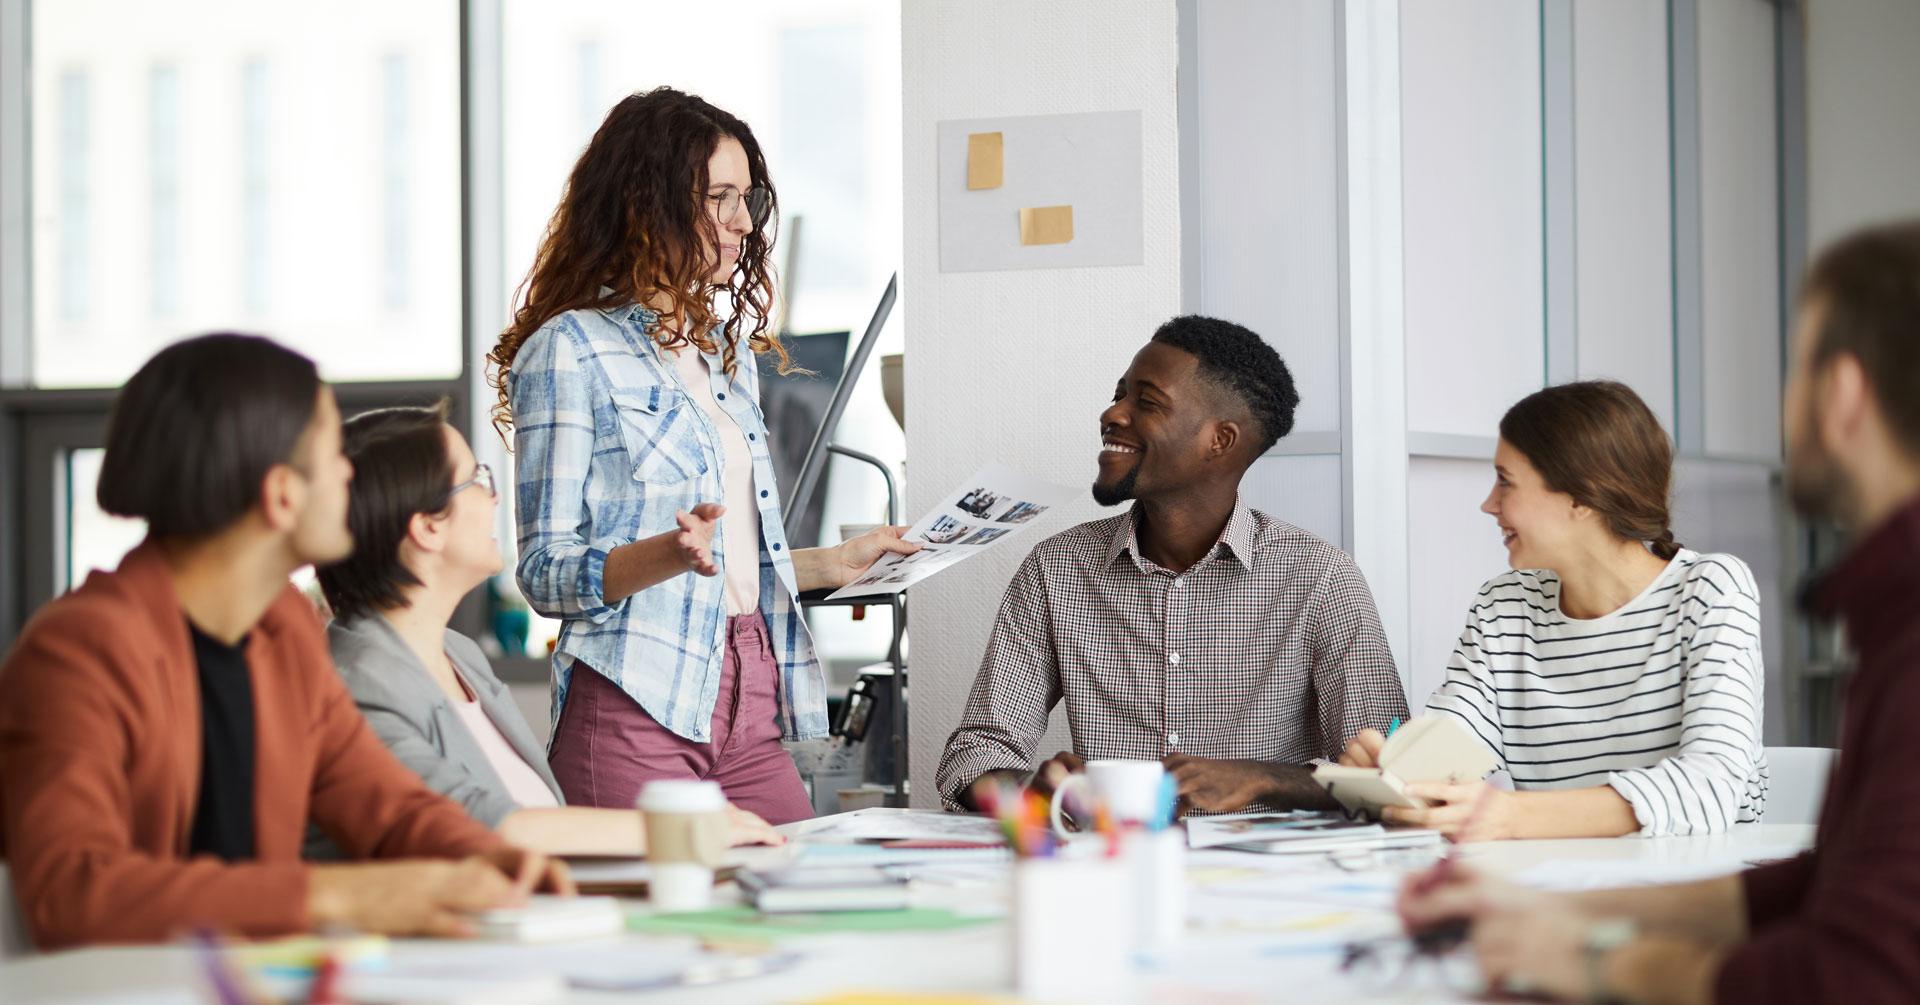 team meeting in a positive organizational culture